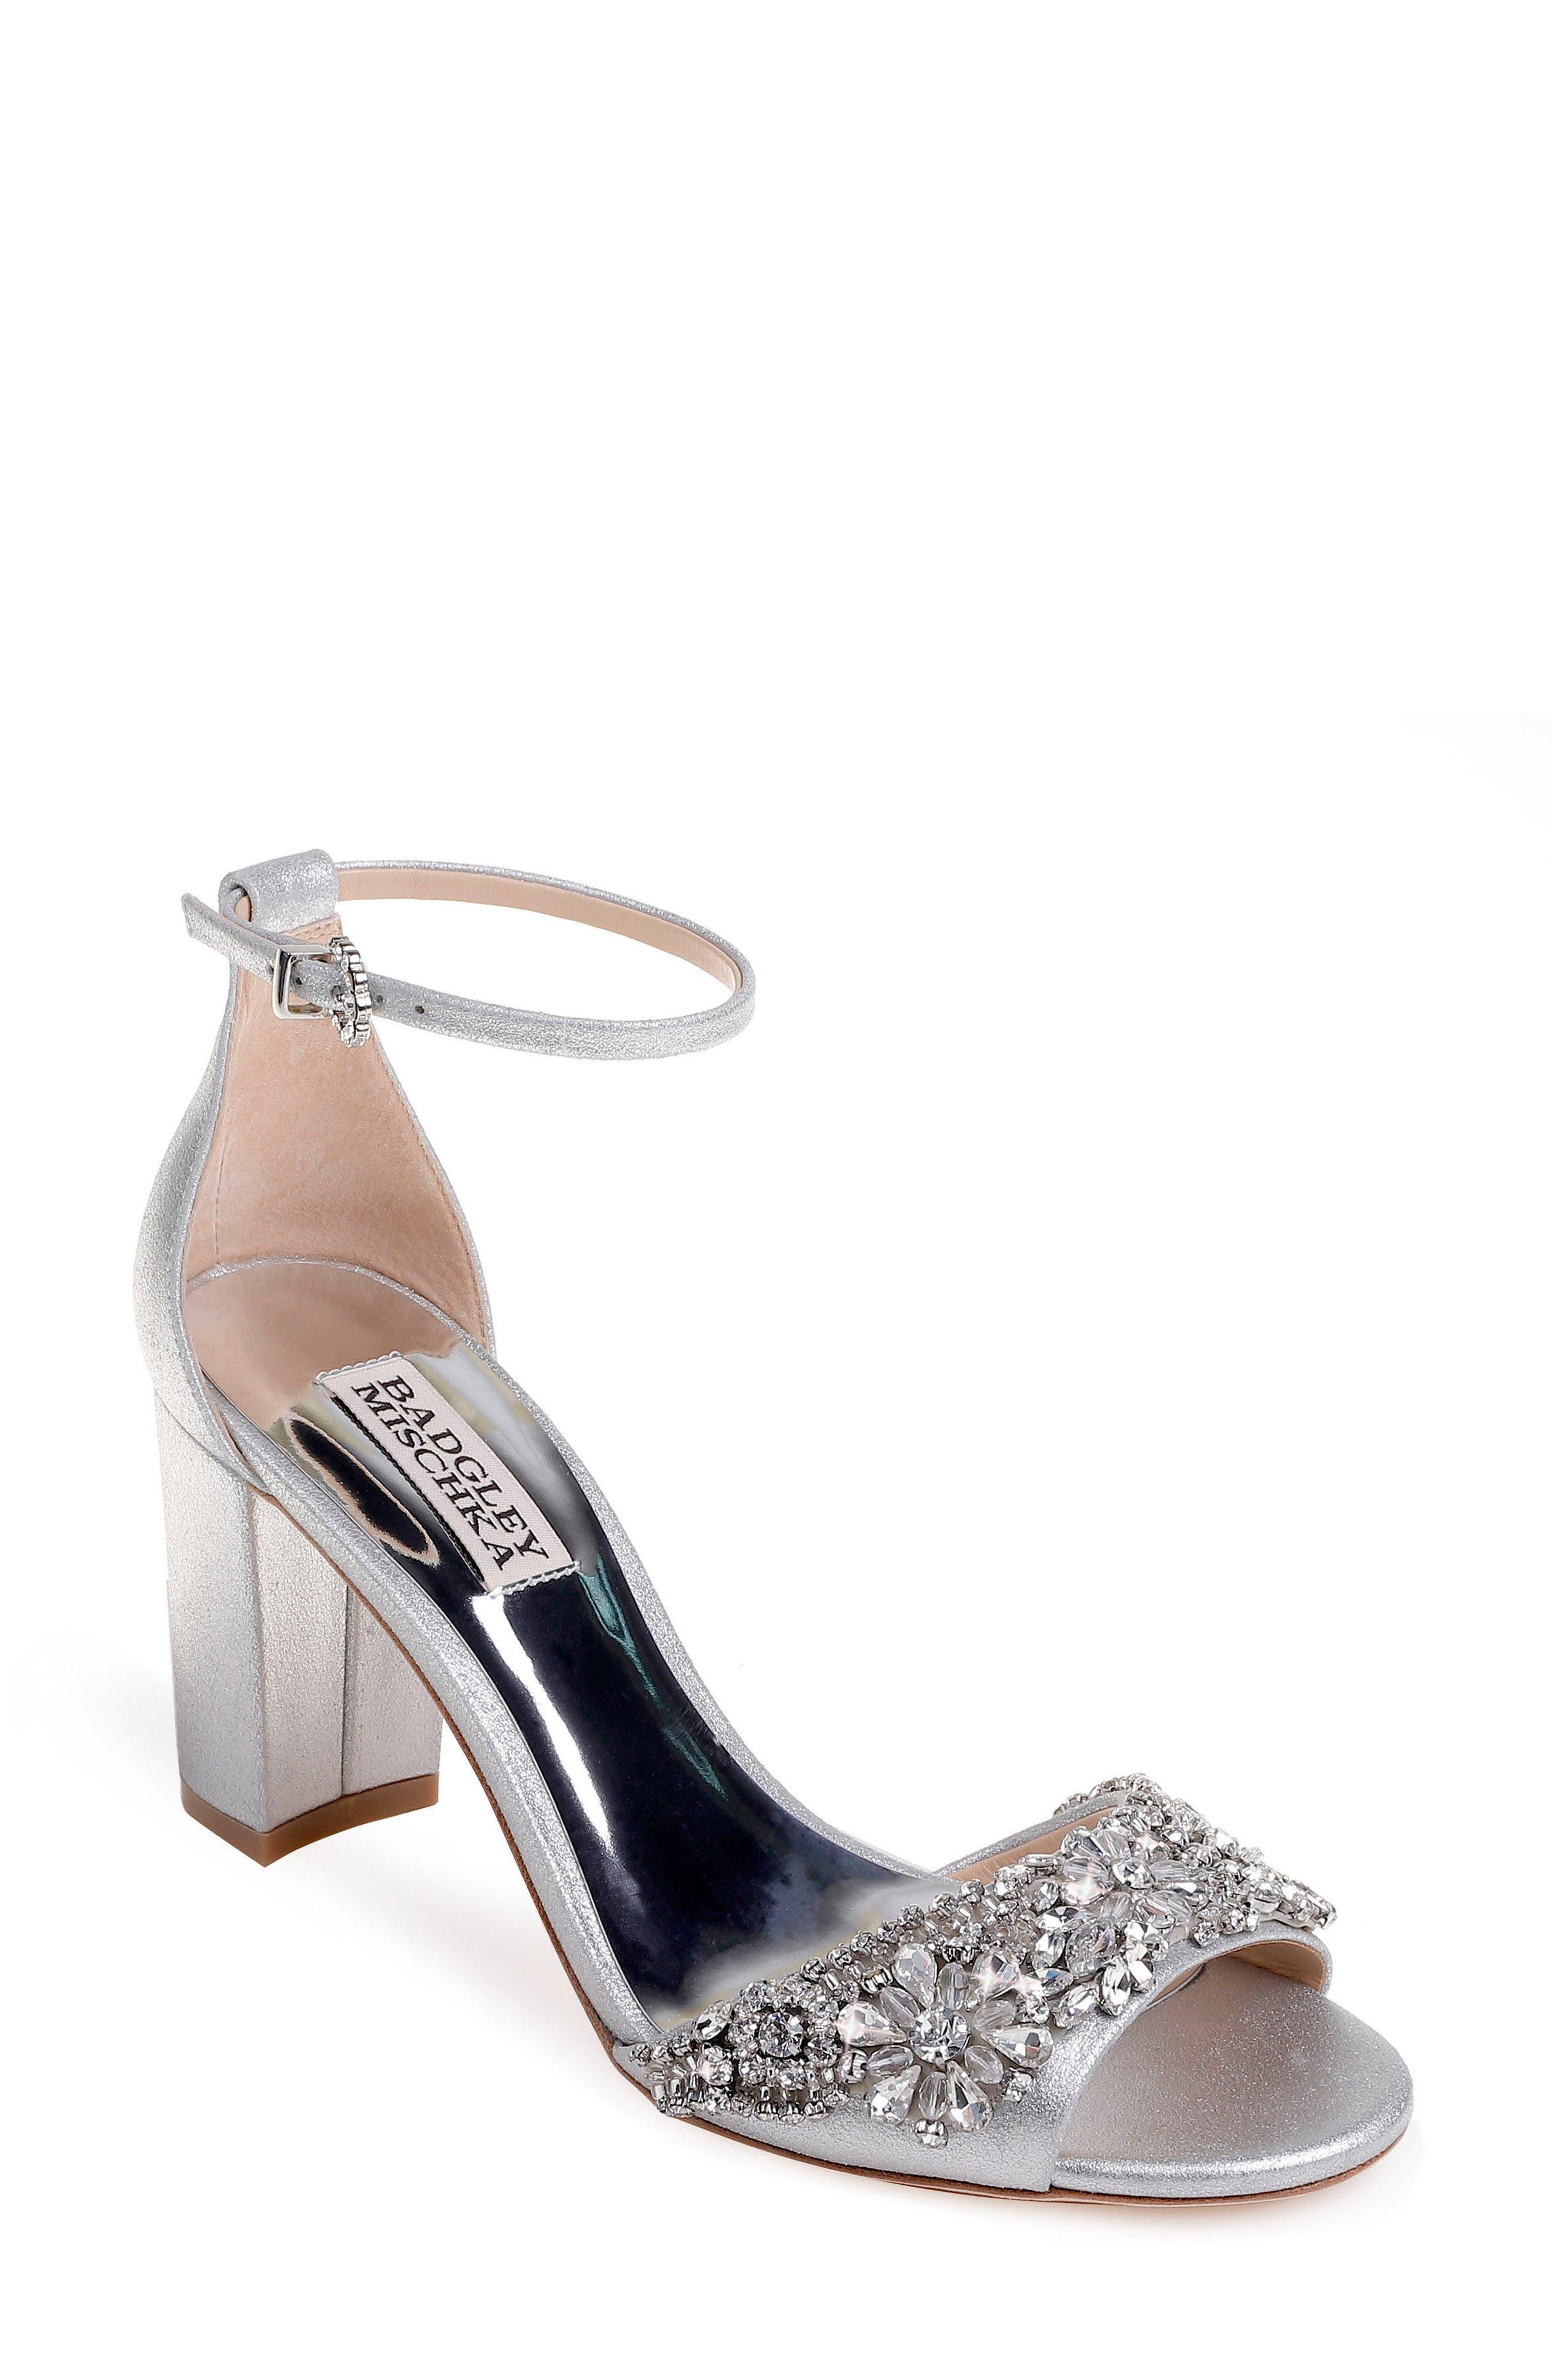 Badgley Mischka Hines Embellished Block Heel Sandal (Women)